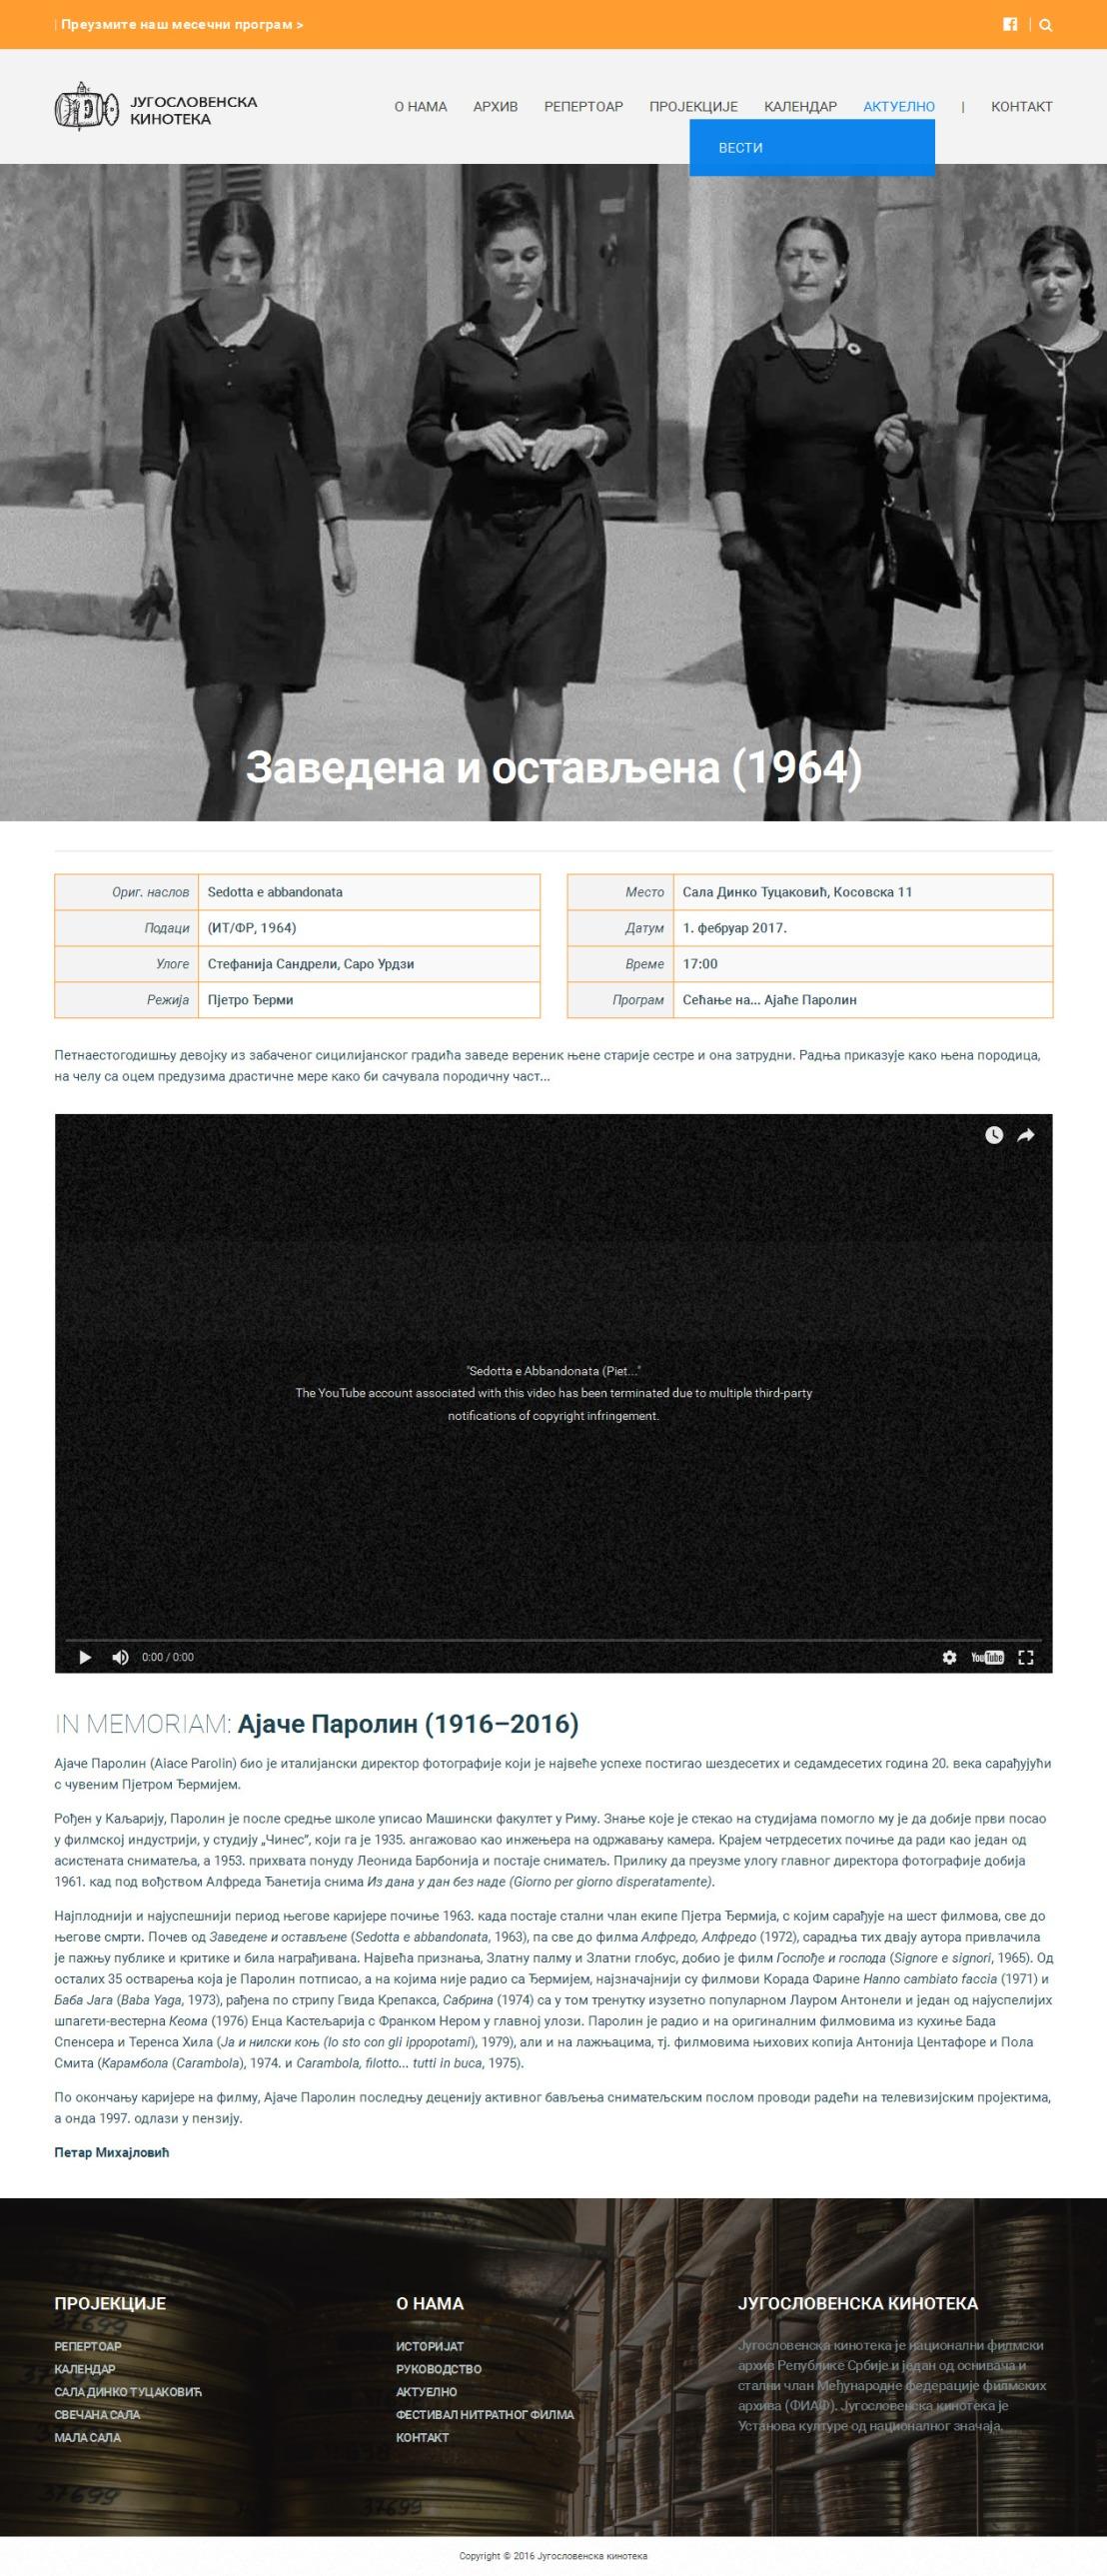 0102 - kinoteka.org.rs - Zavedena i ostavljena.jpg